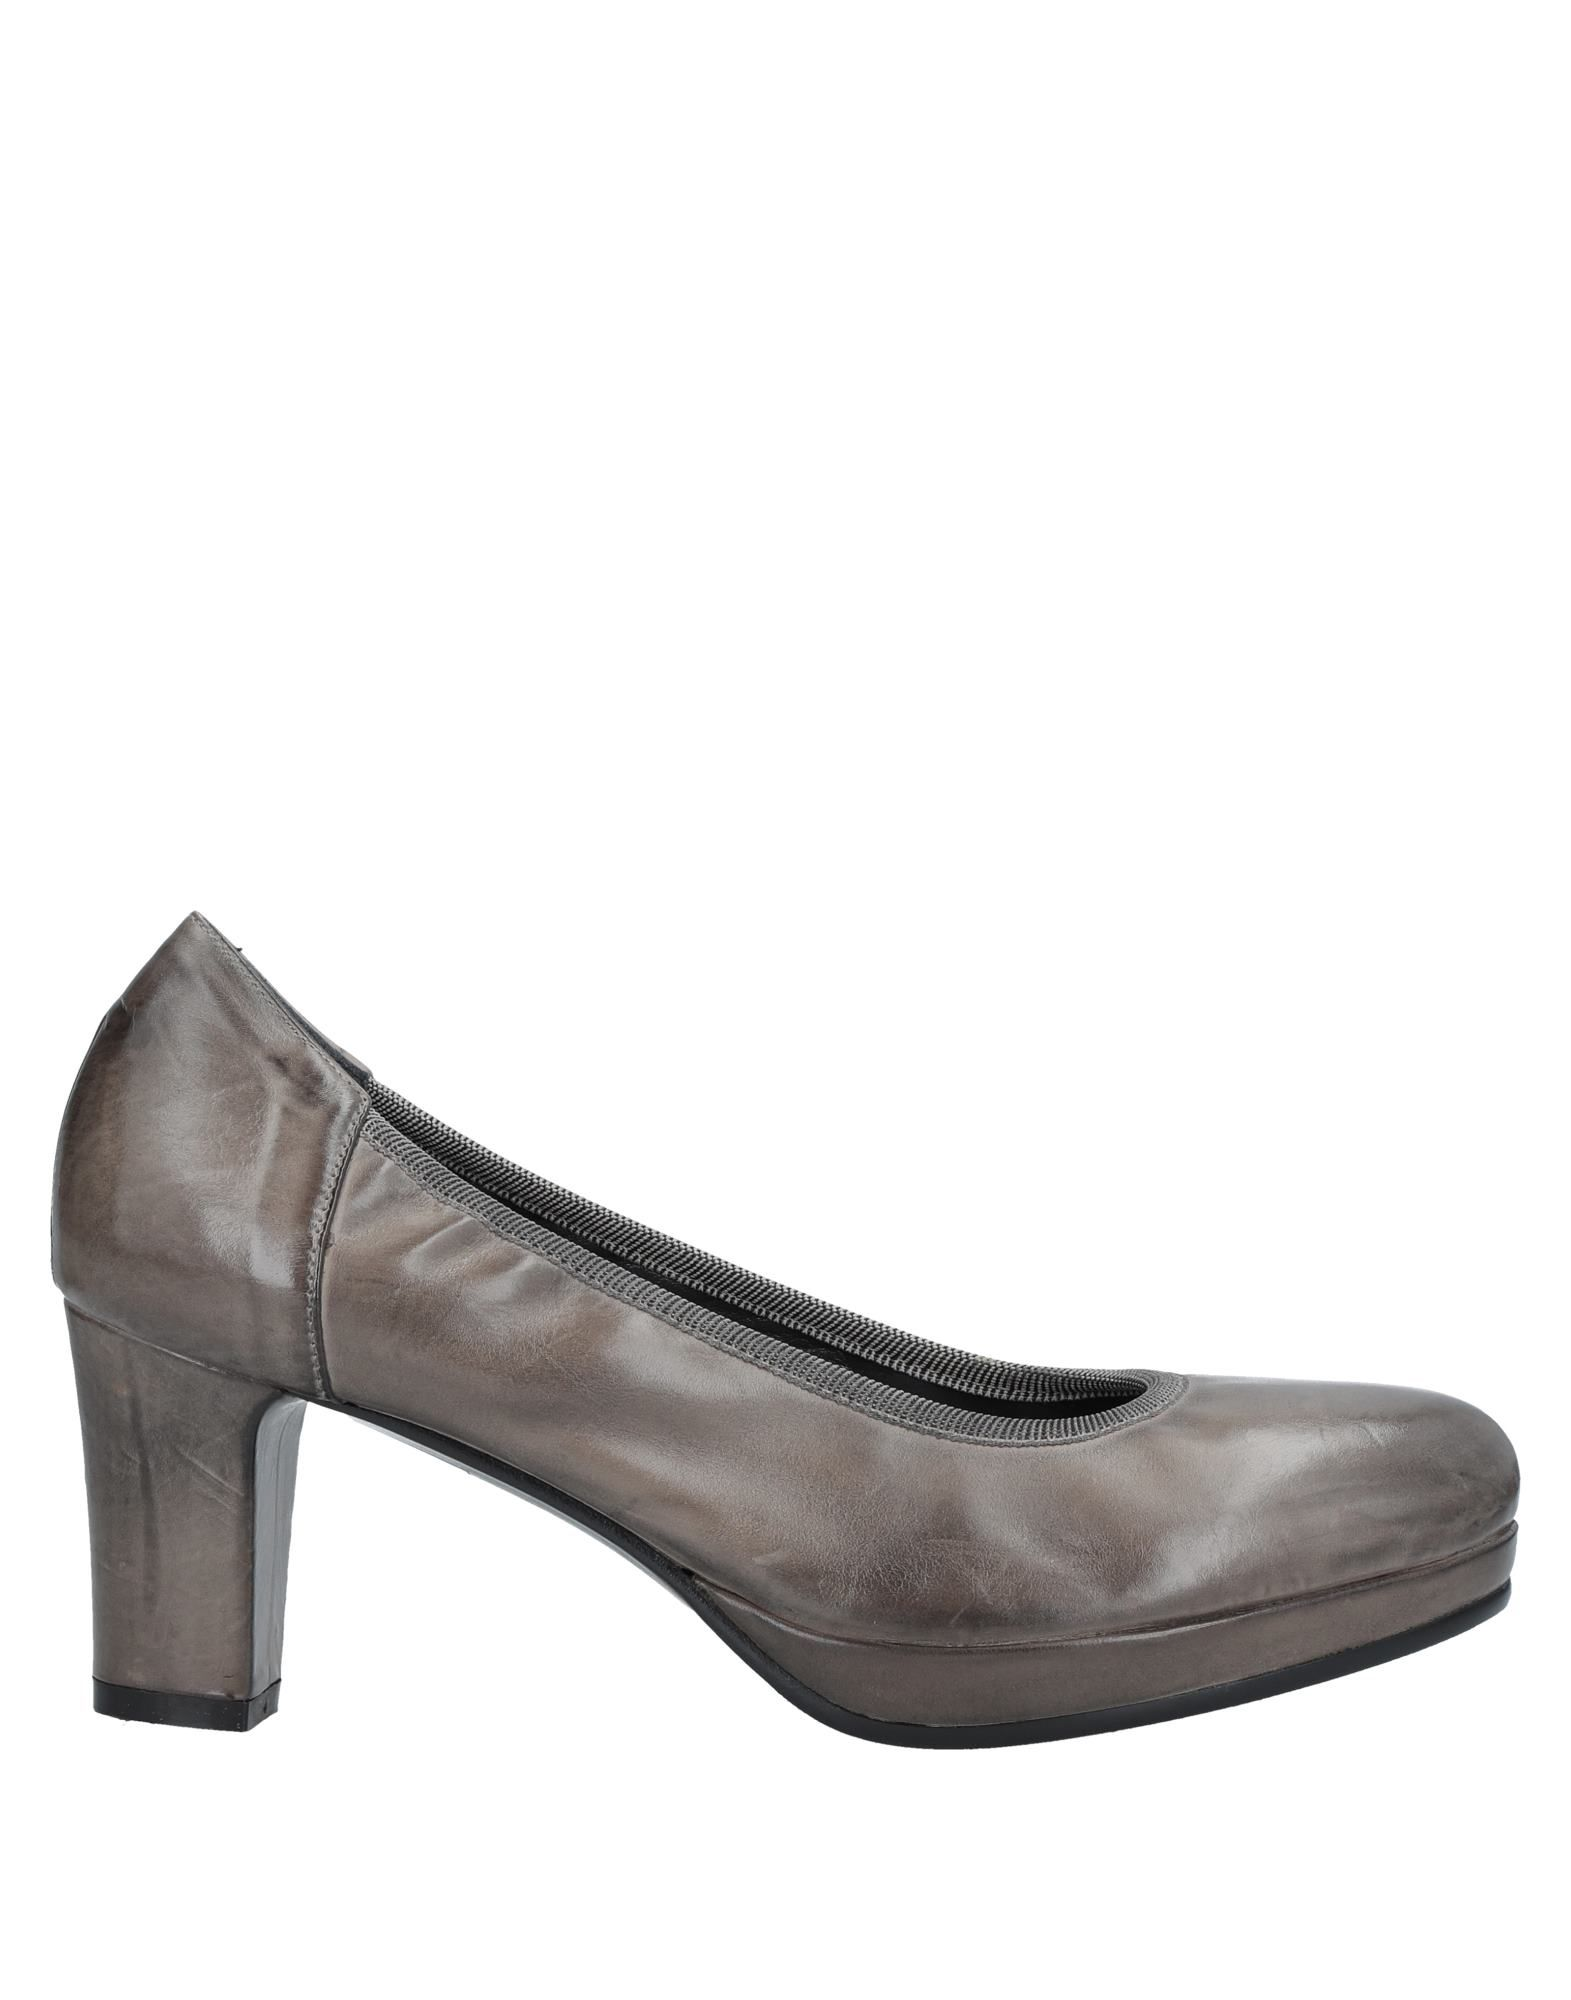 Calpierre Pumps Damen  11539862UX Gute Qualität beliebte Schuhe